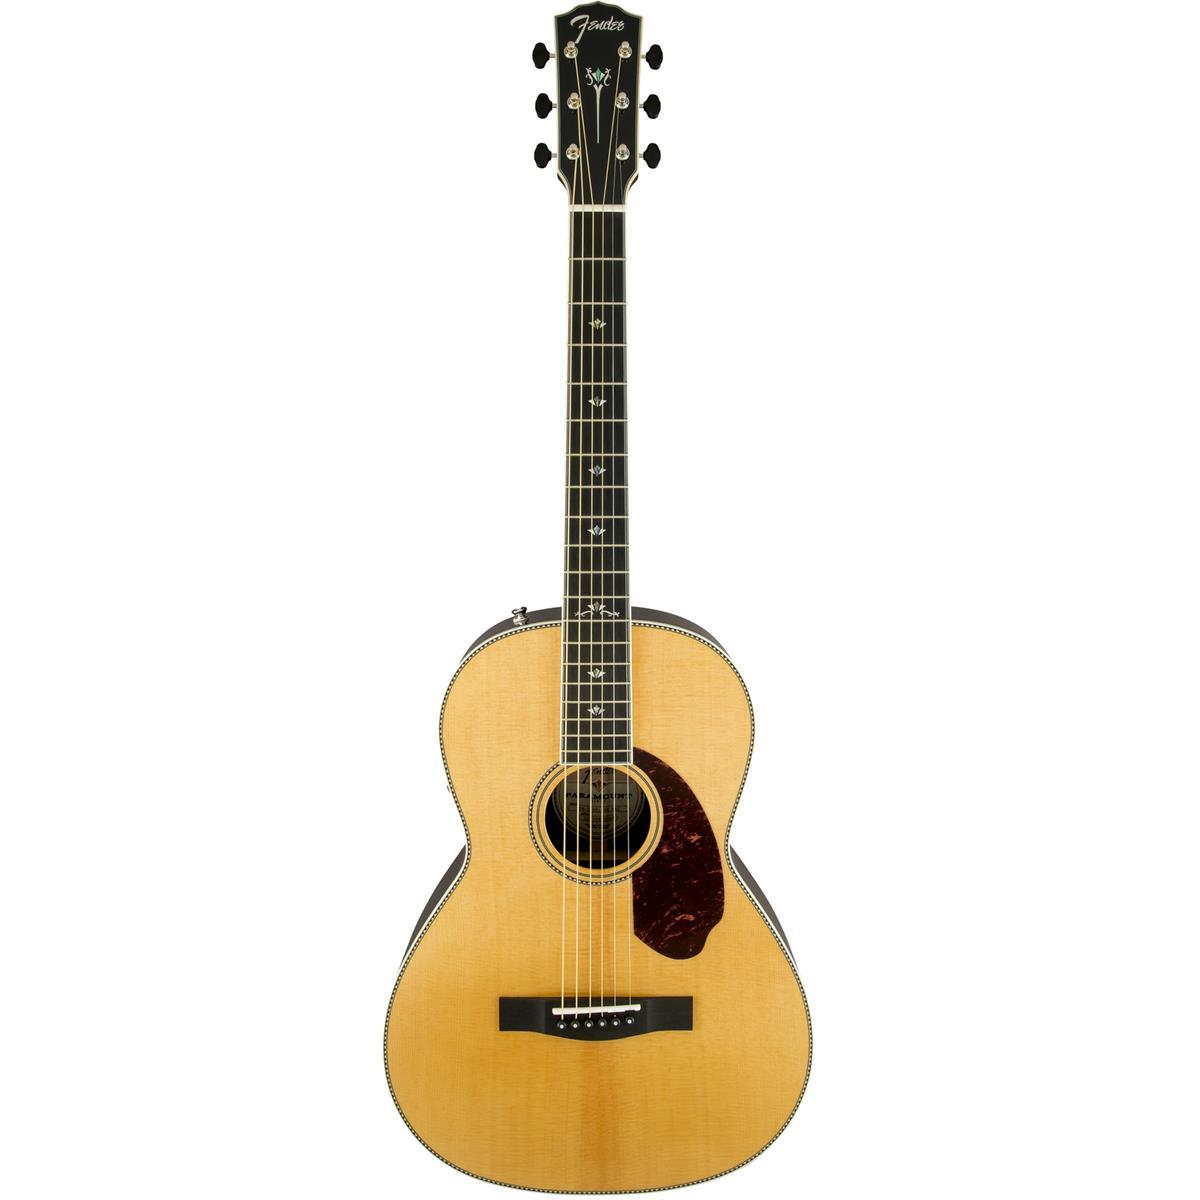 Fender PM-2E Deluxe Parlor, NAT western-guitar natur